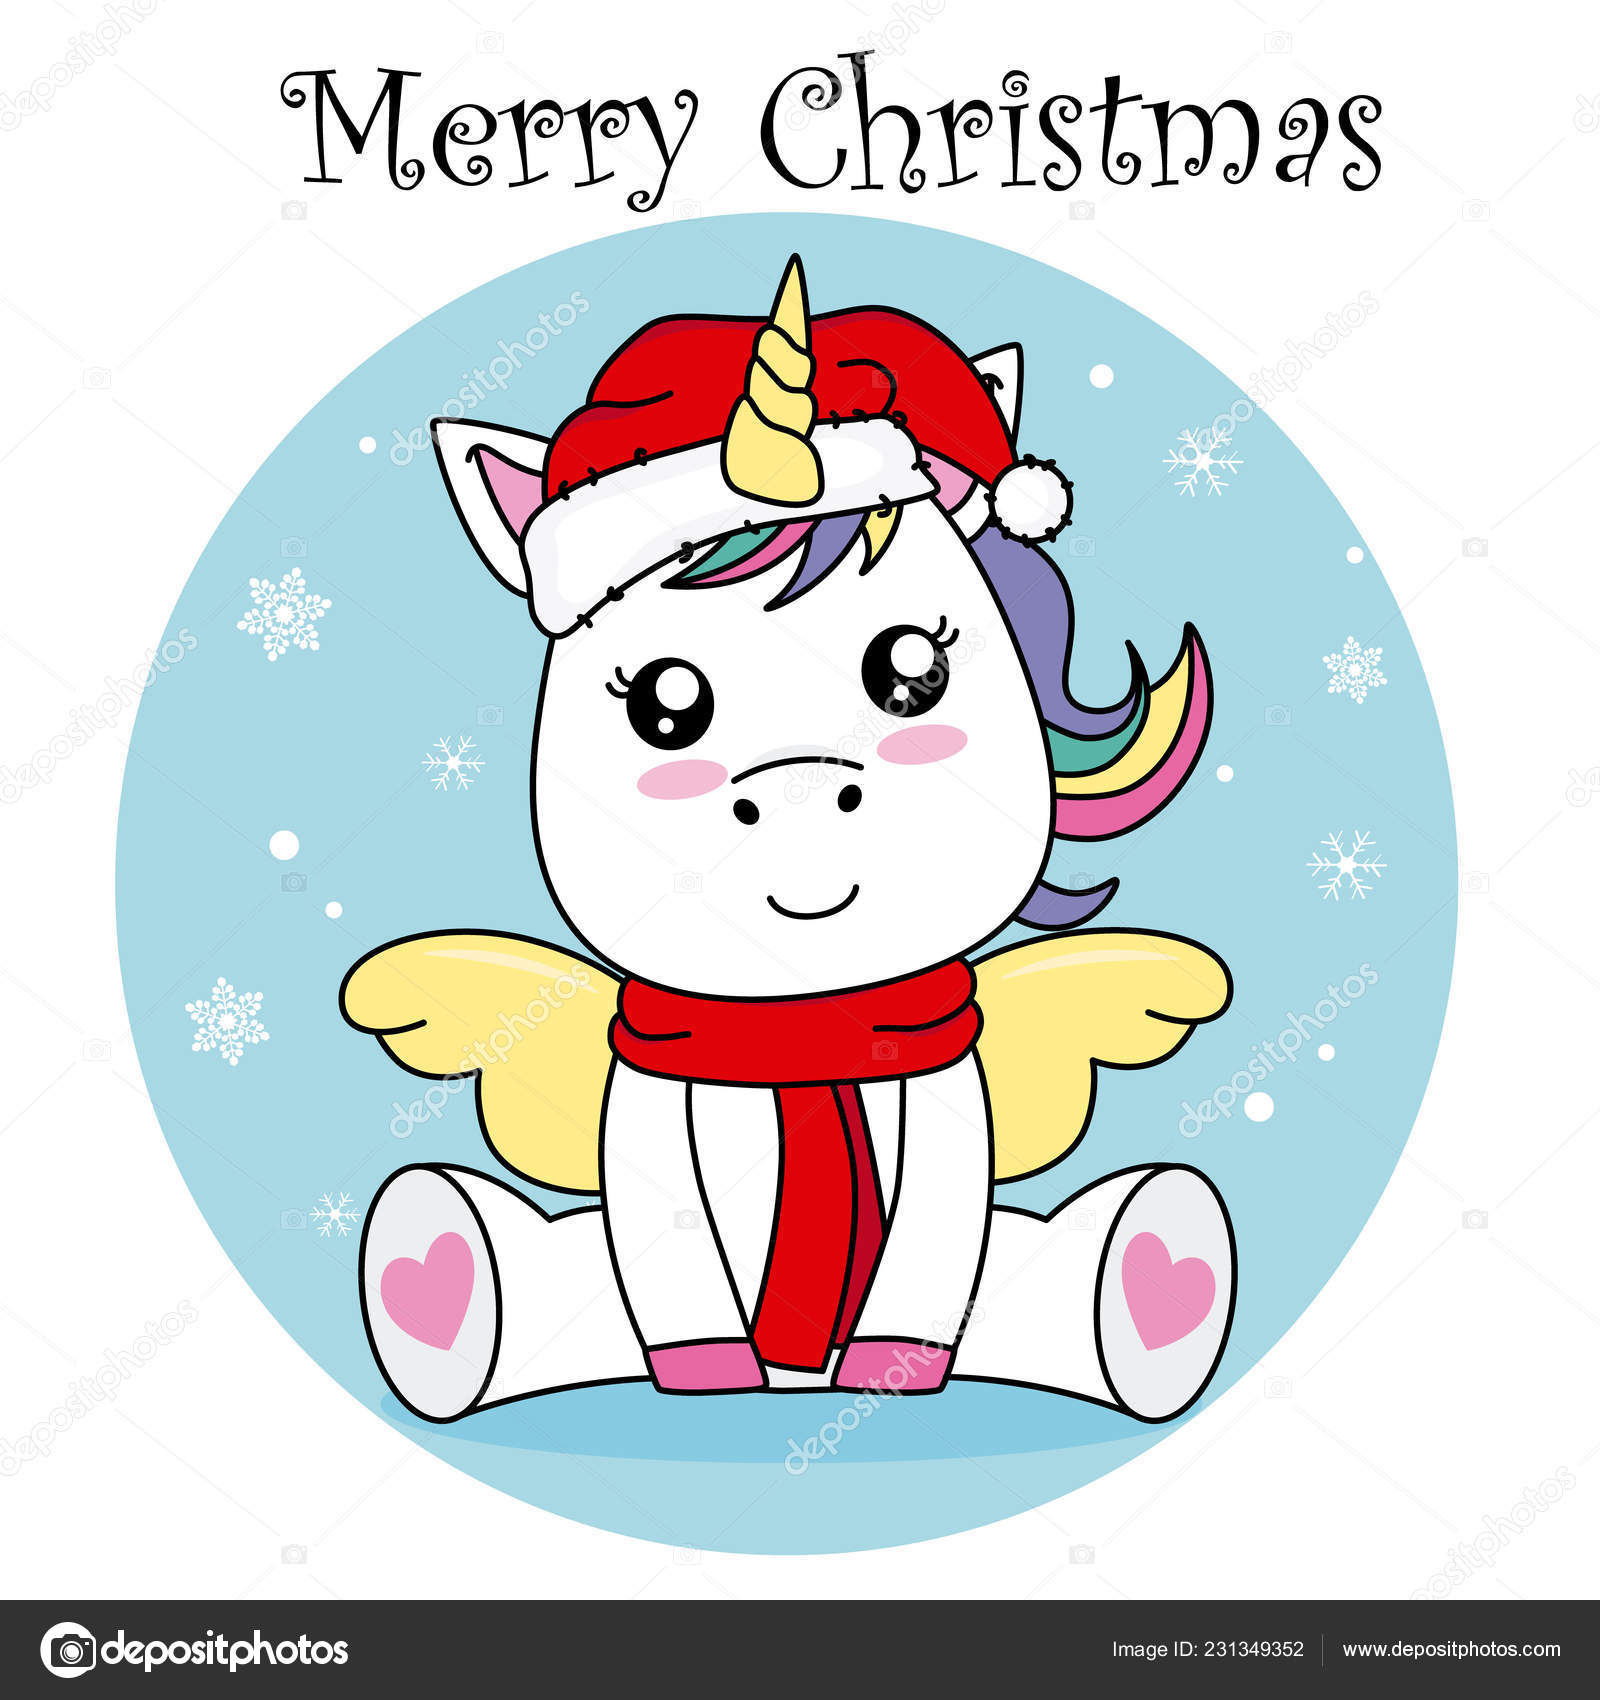 Merry Christmas Card Unicorn Santa Claus Hat Stock Vector C Sbego 231349352